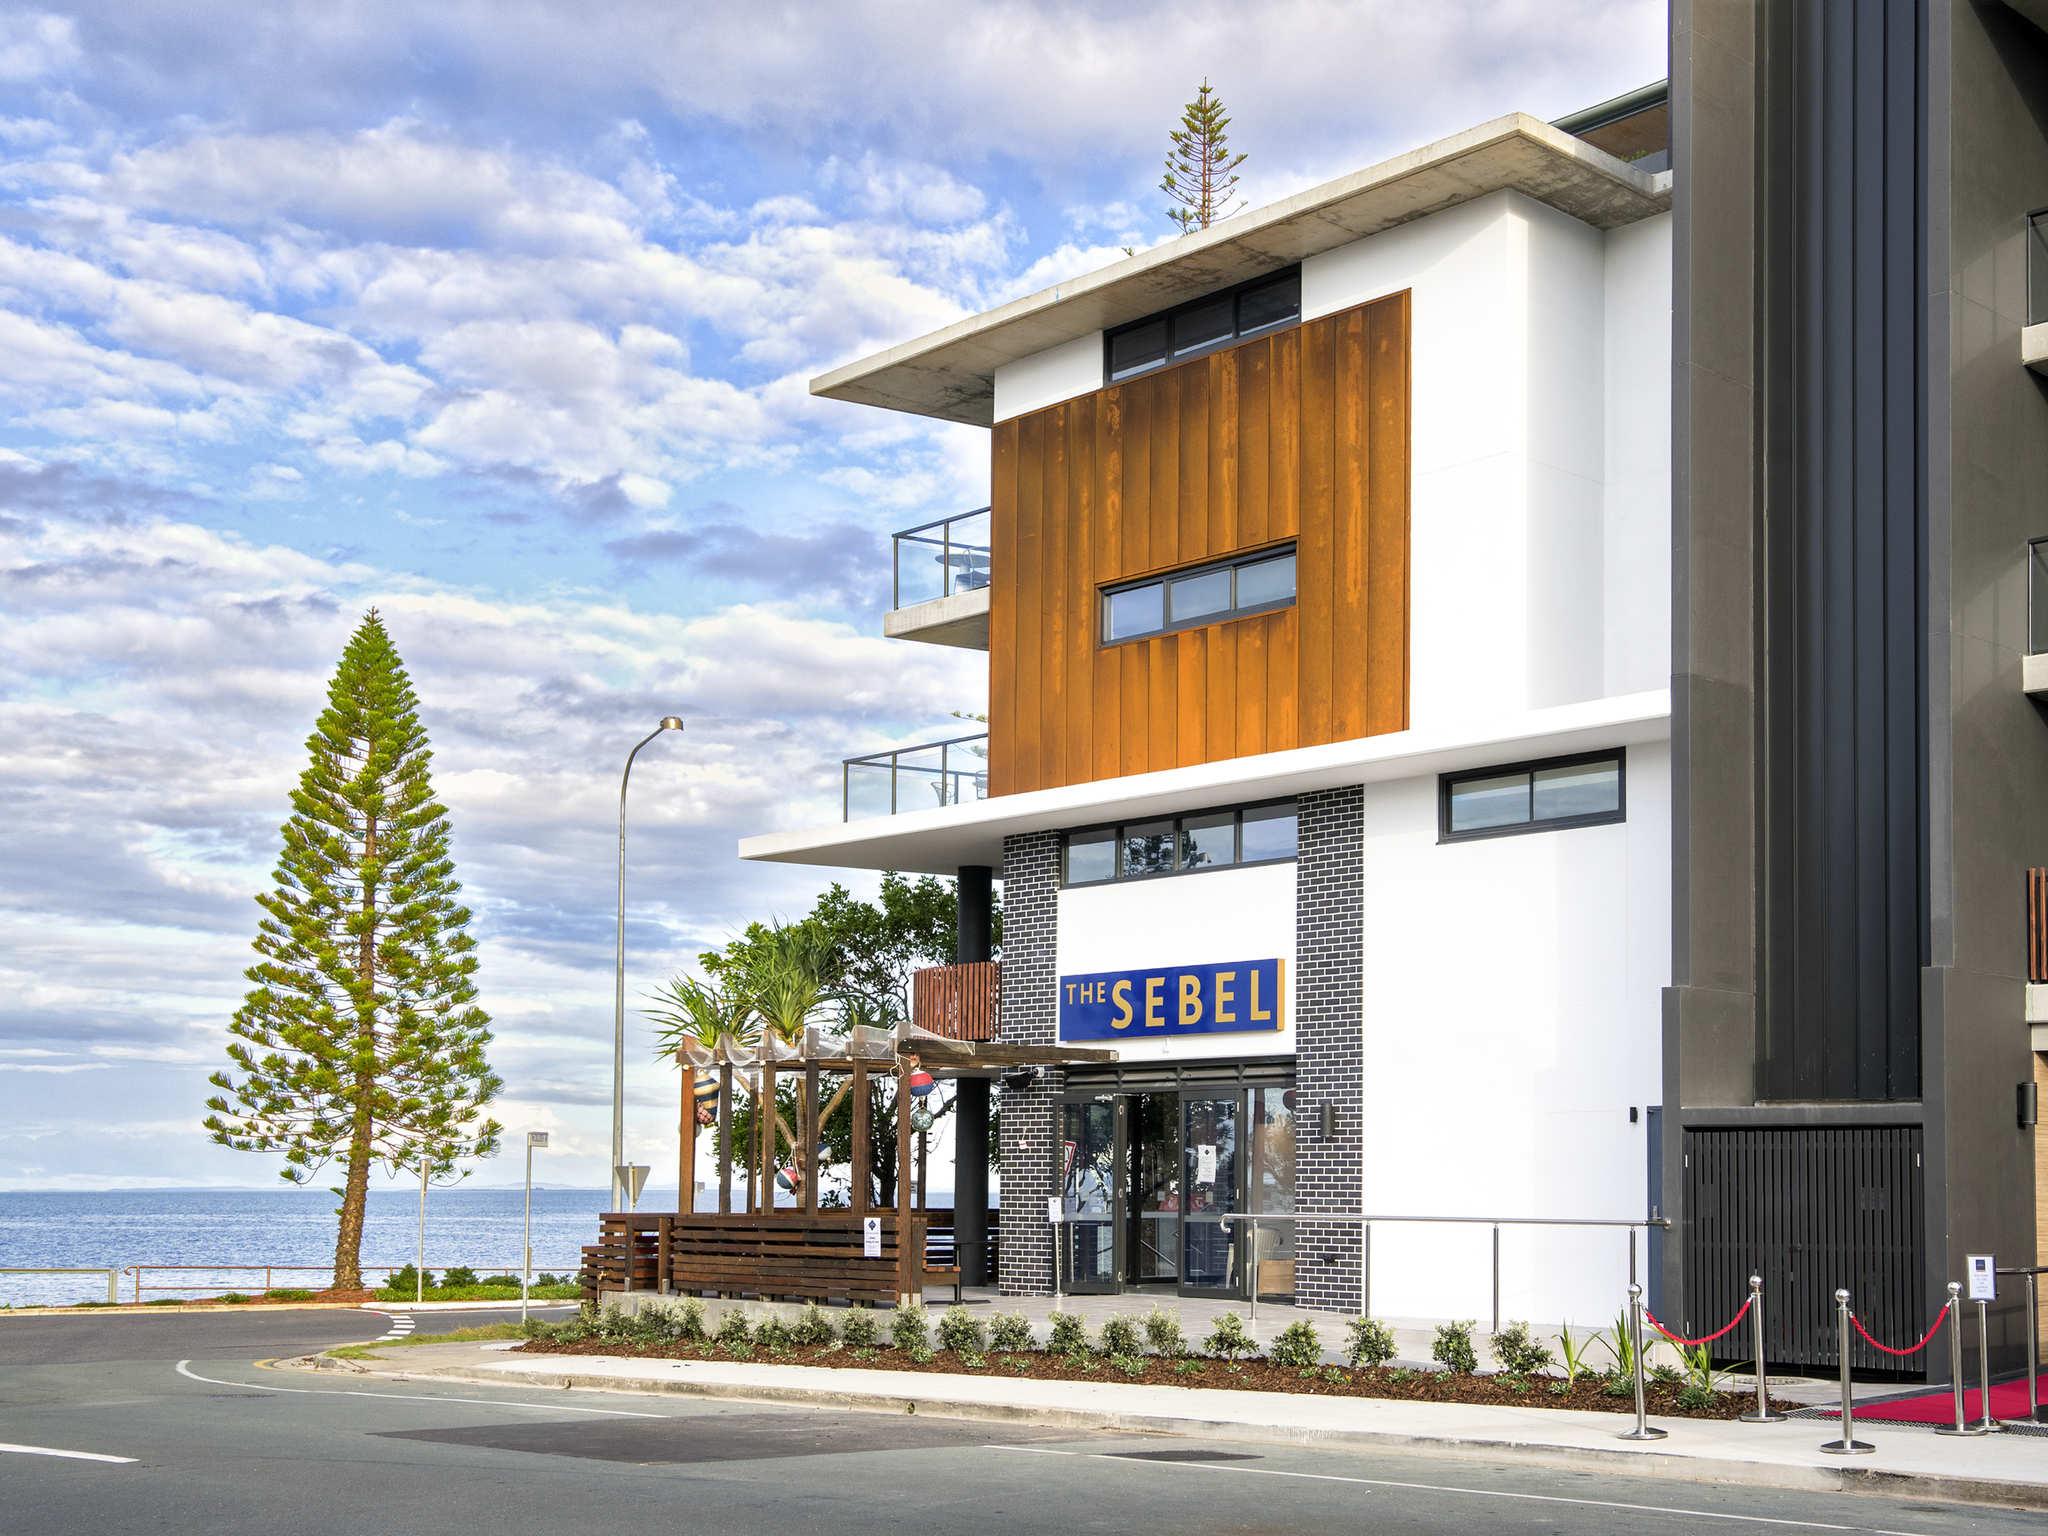 Hôtel - The Sebel Brisbane Margate Beach